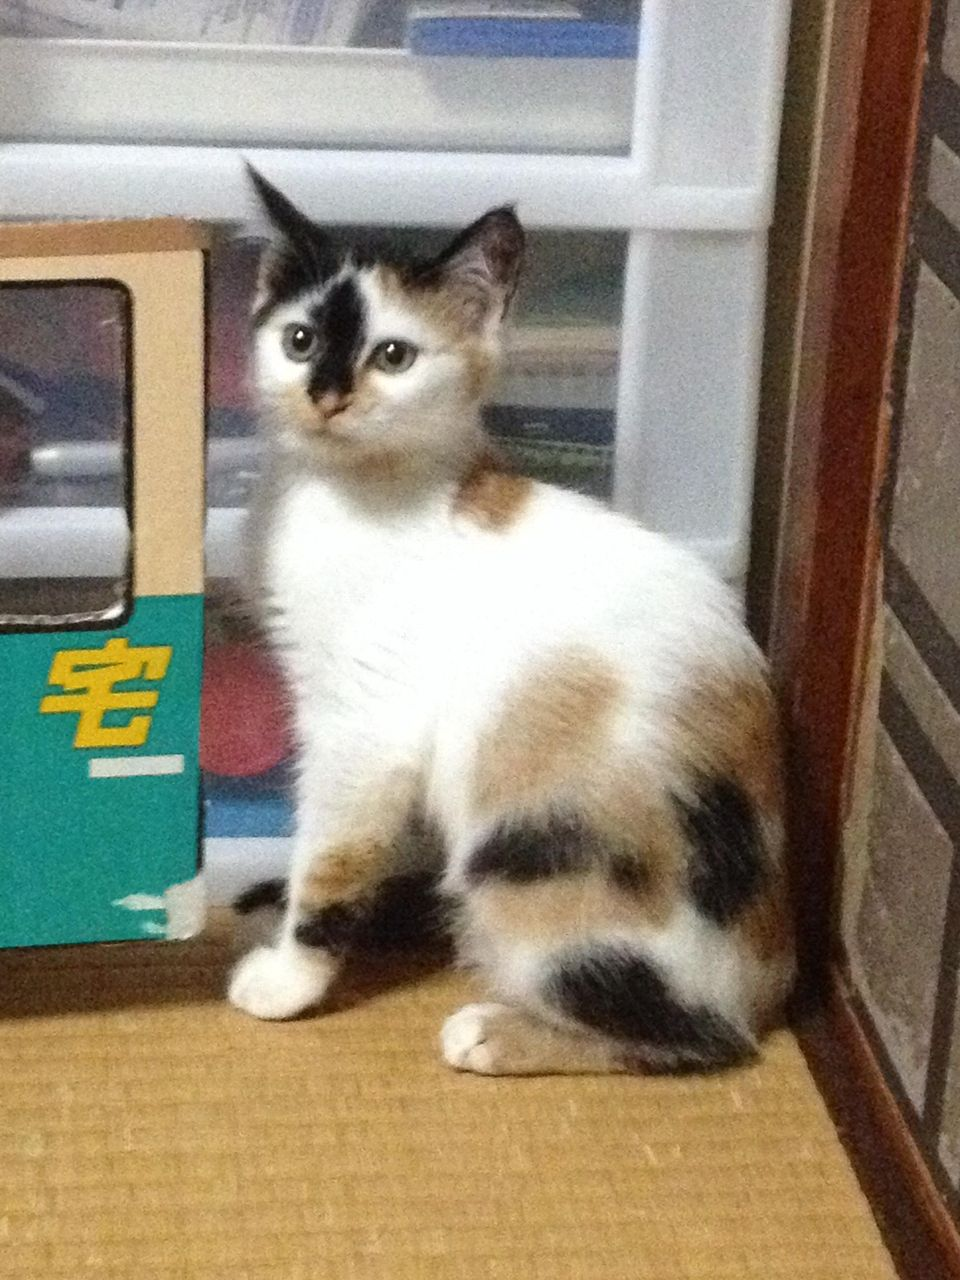 http://livedoor.blogimg.jp/akan2ch/imgs/b/f/bf6be327.jpg